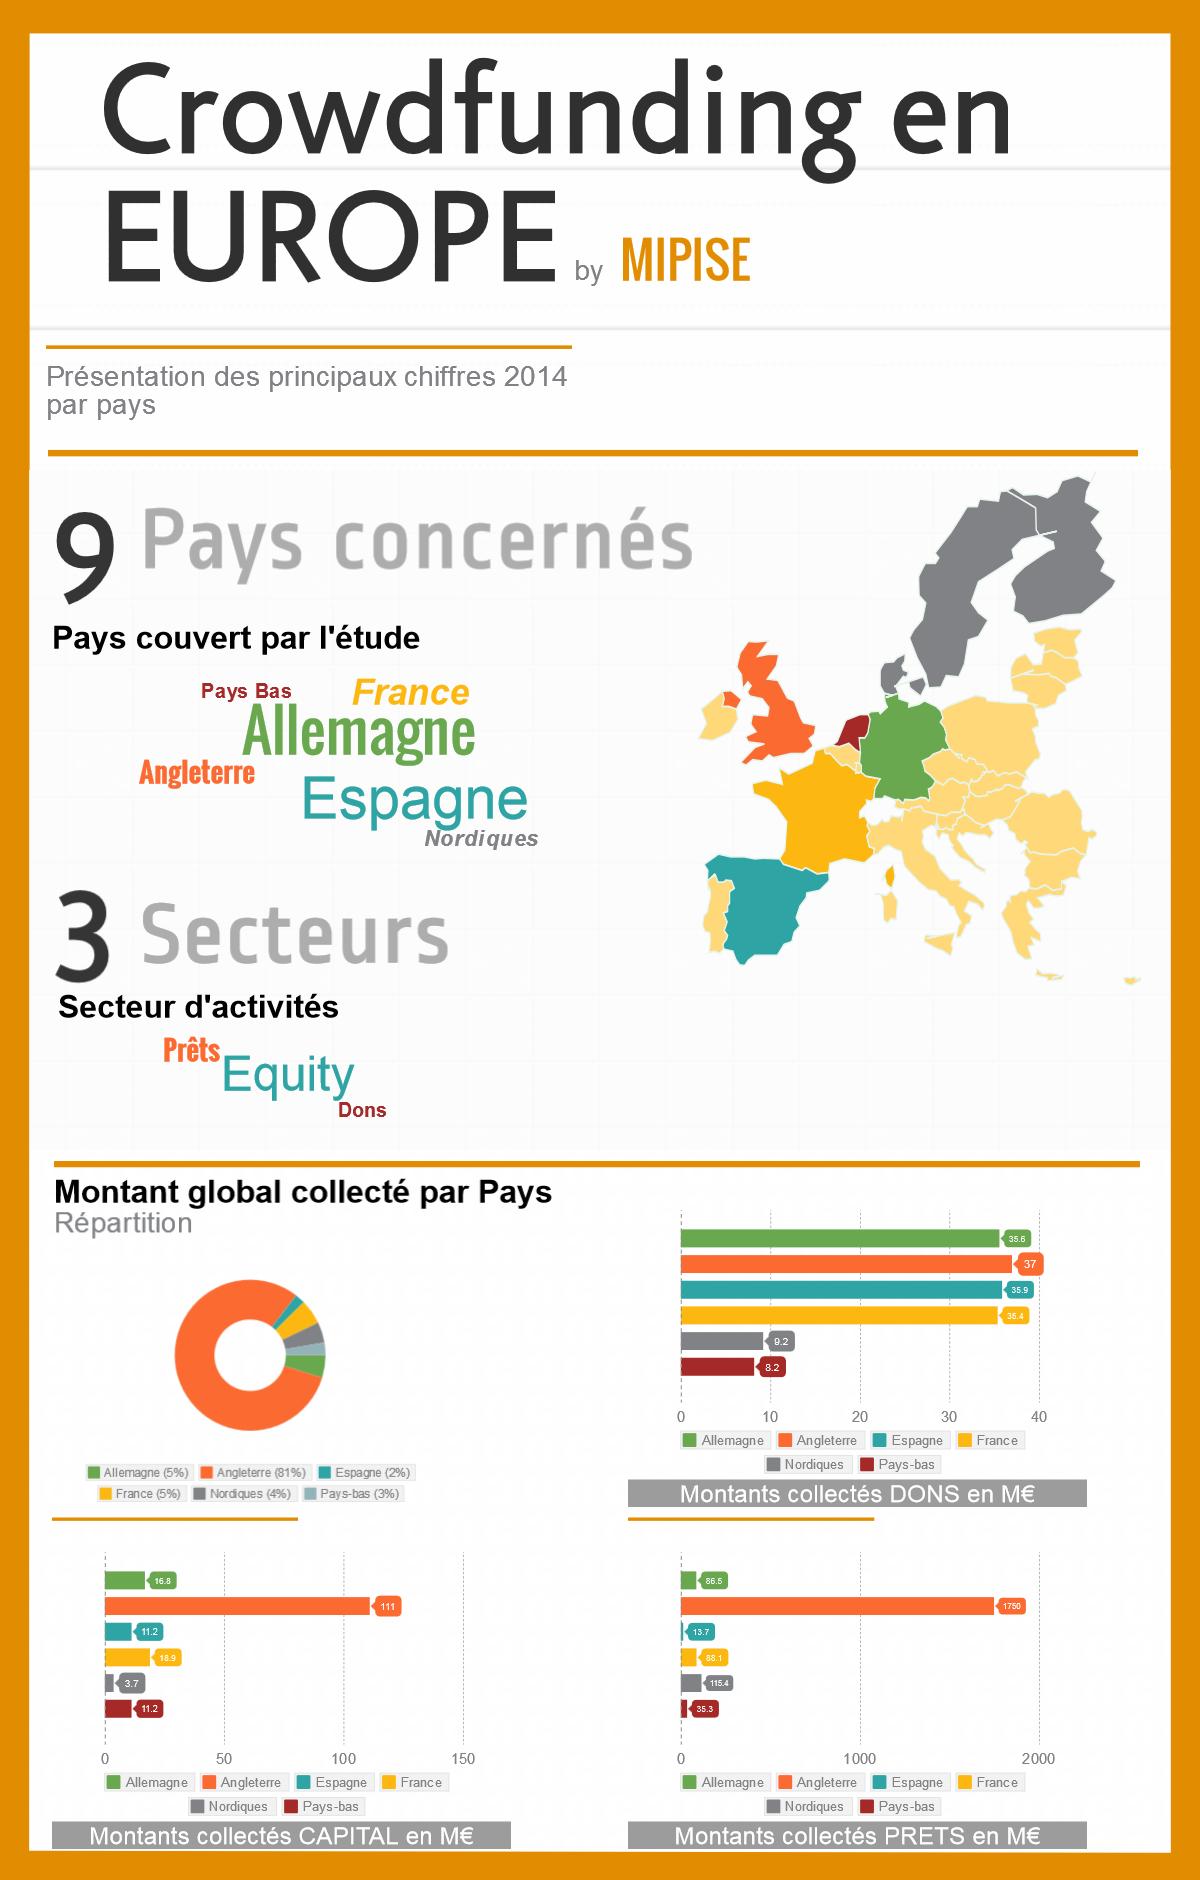 Infographie du crowdfunding en Europe en 2014